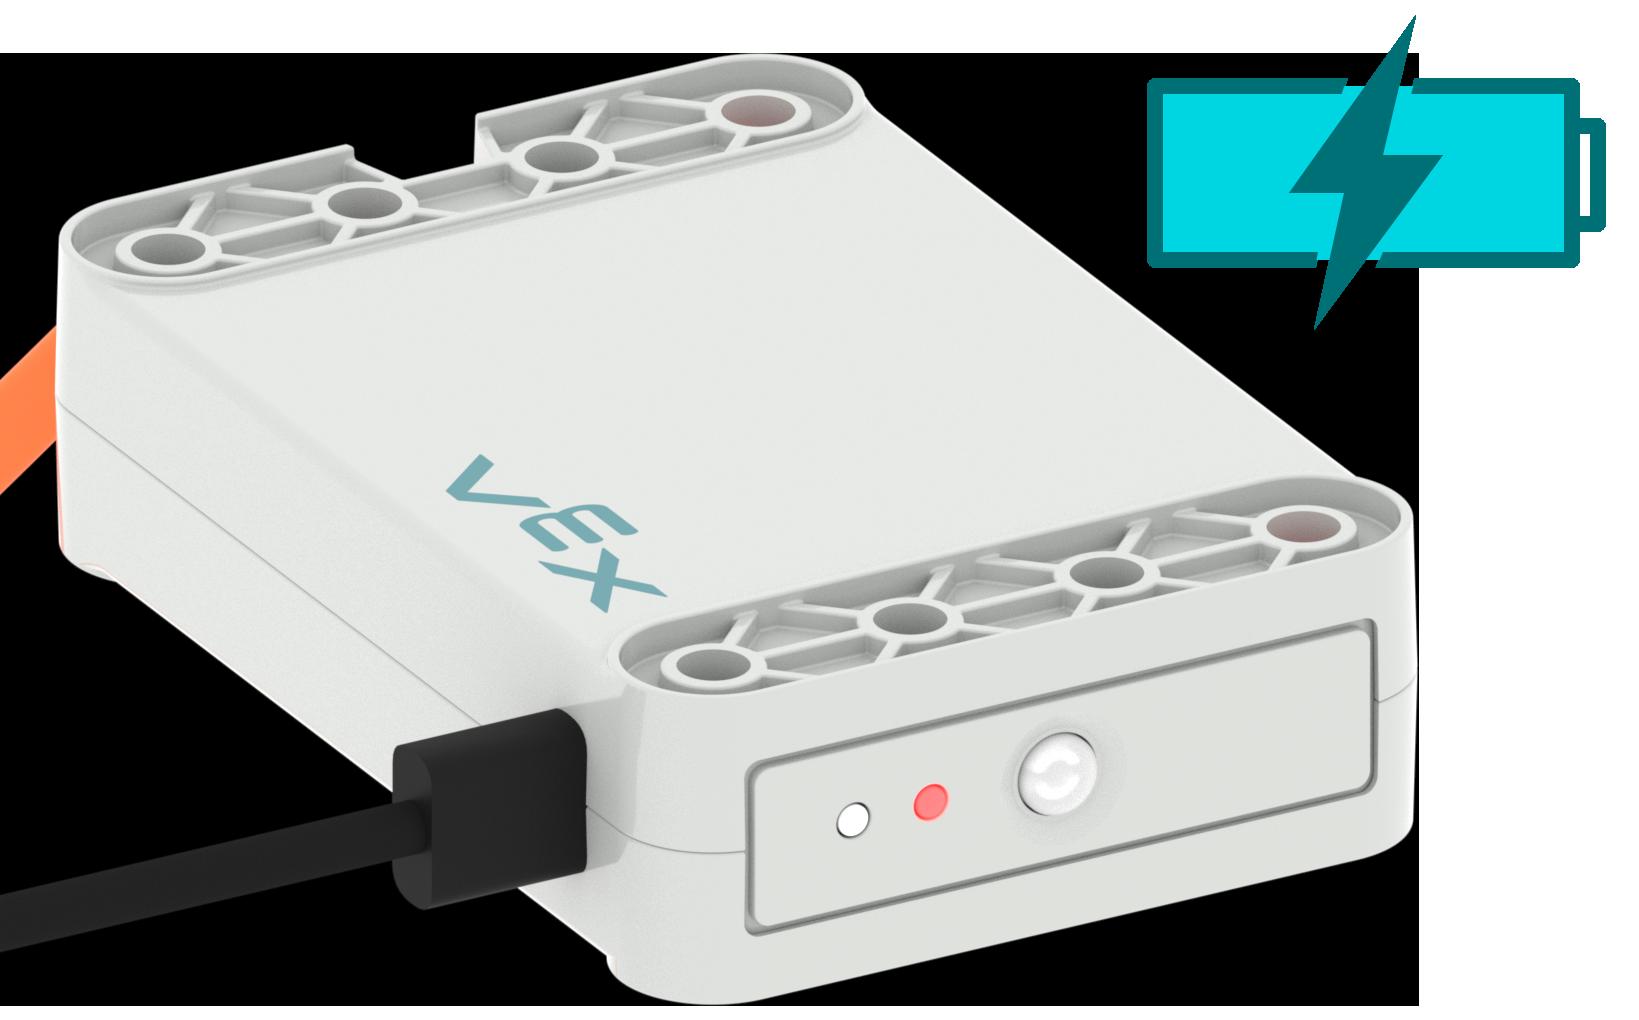 GO_Battery-ChargingSymbol.png